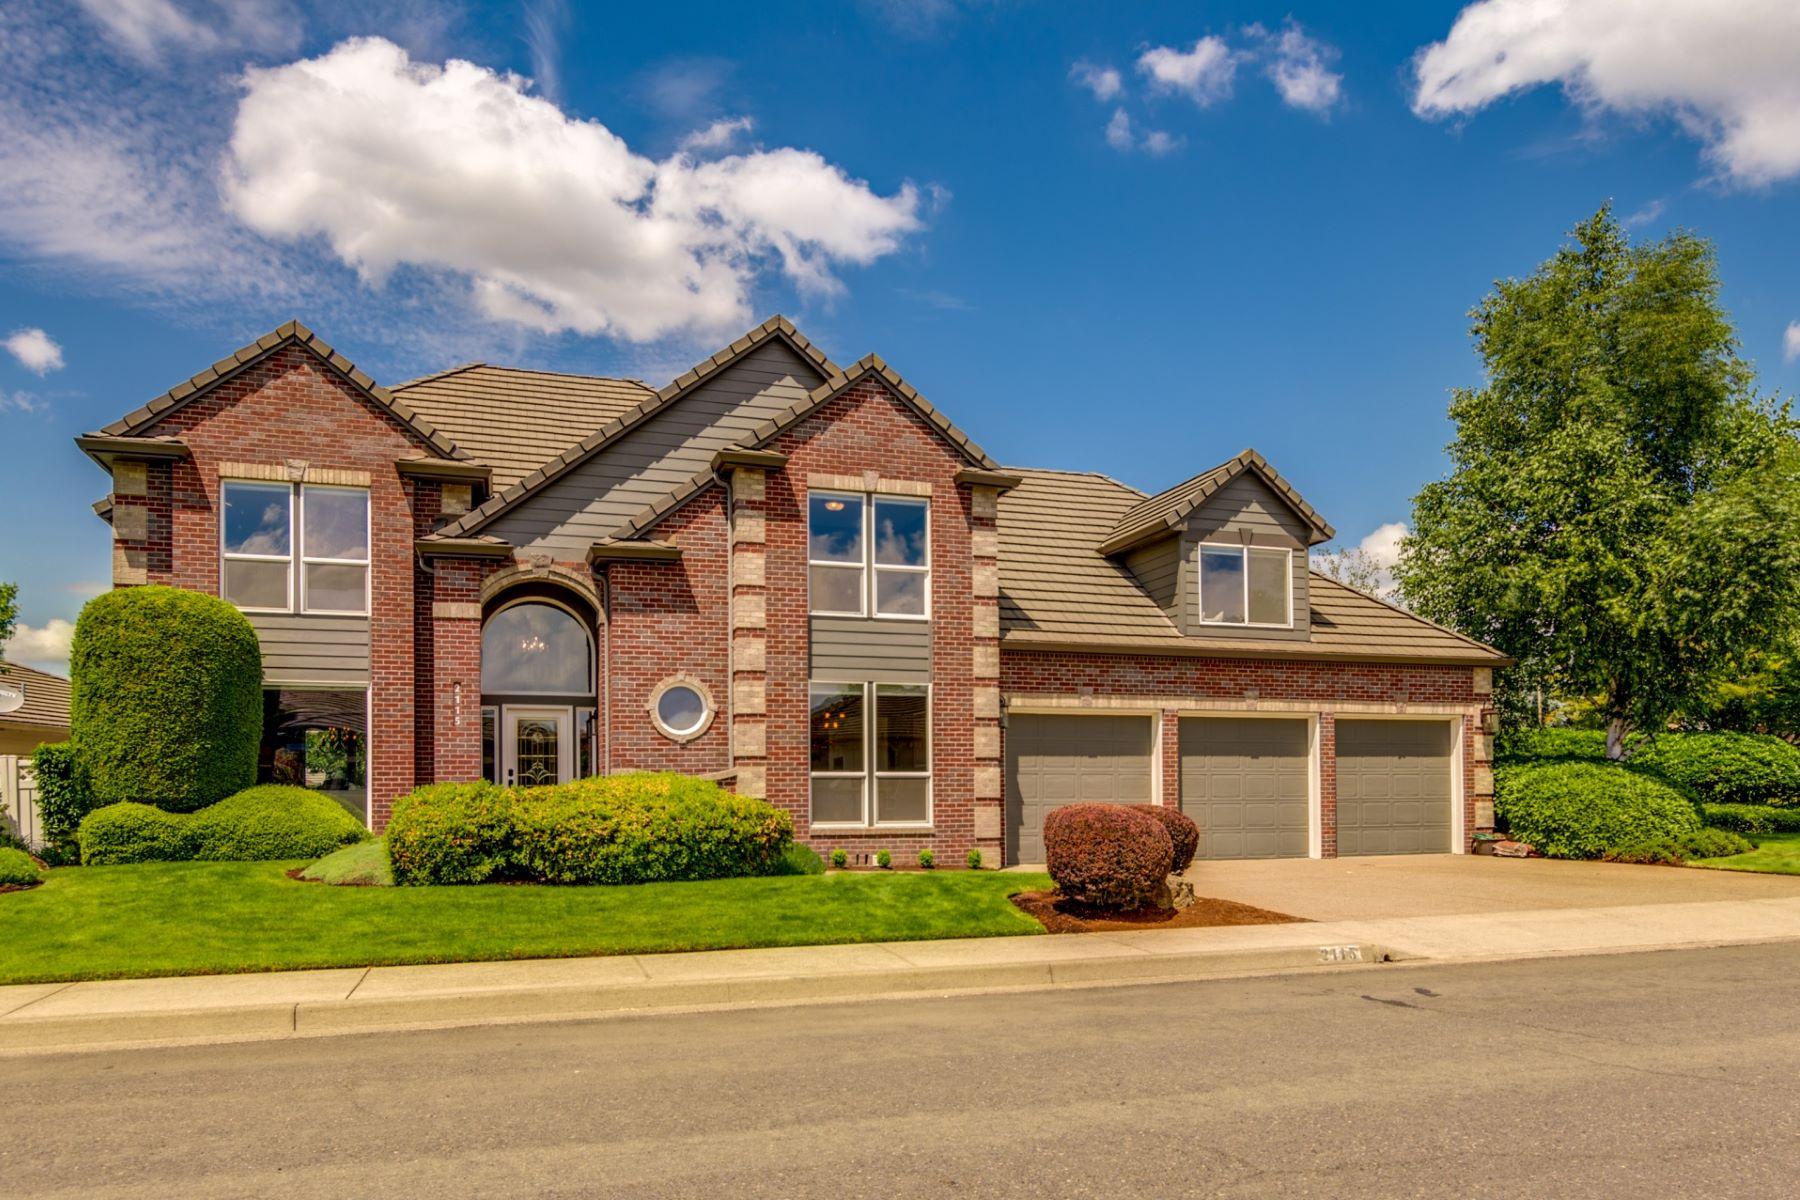 Single Family Homes for Sale at 2115 NW Hood Drive 2115 NW Hood Dr Camas, Washington 98607 United States